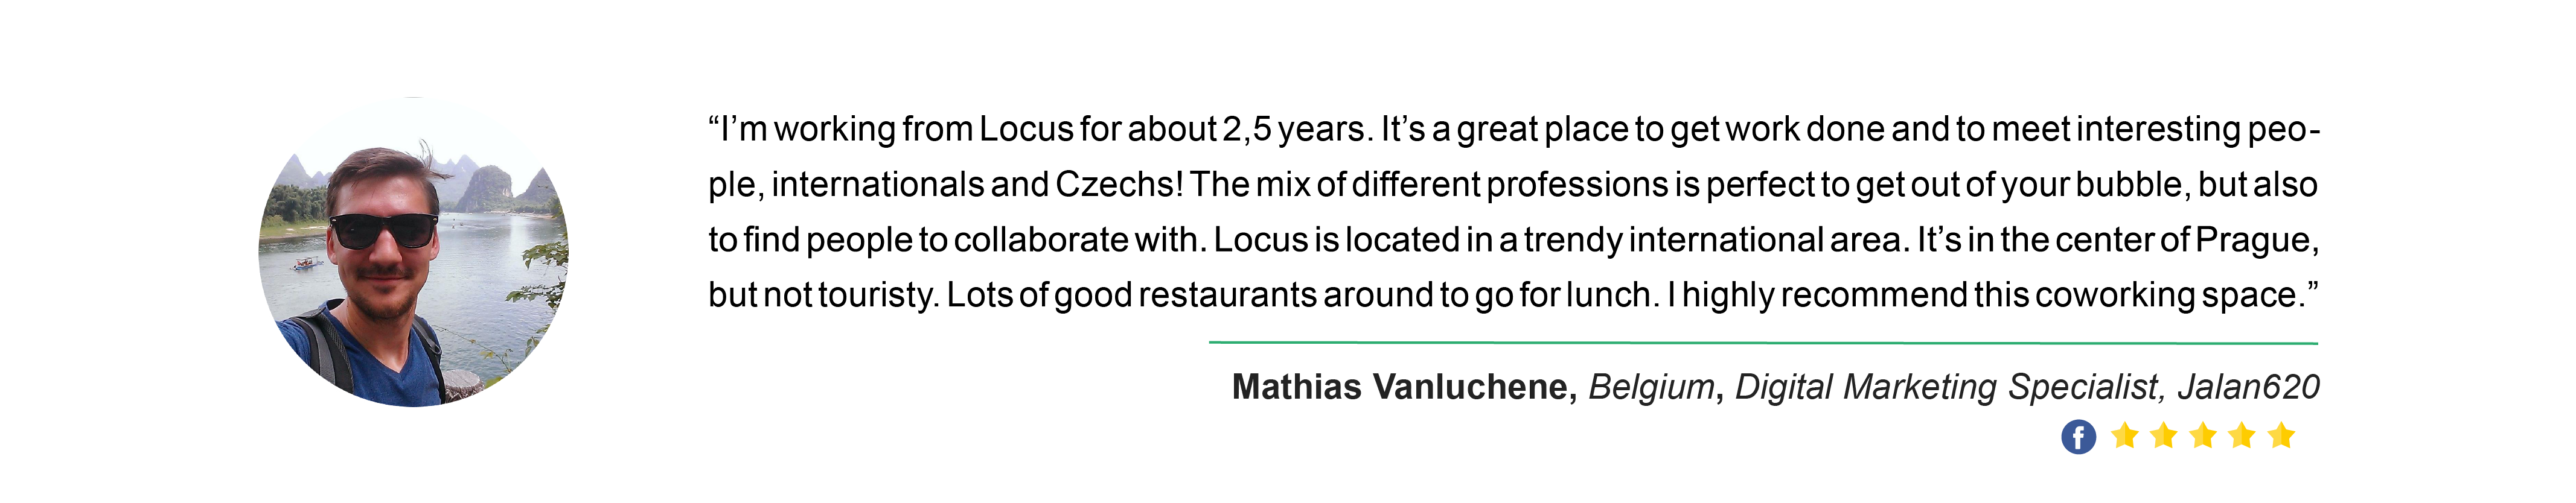 Locus Testimonial - Mathias Vanluchene